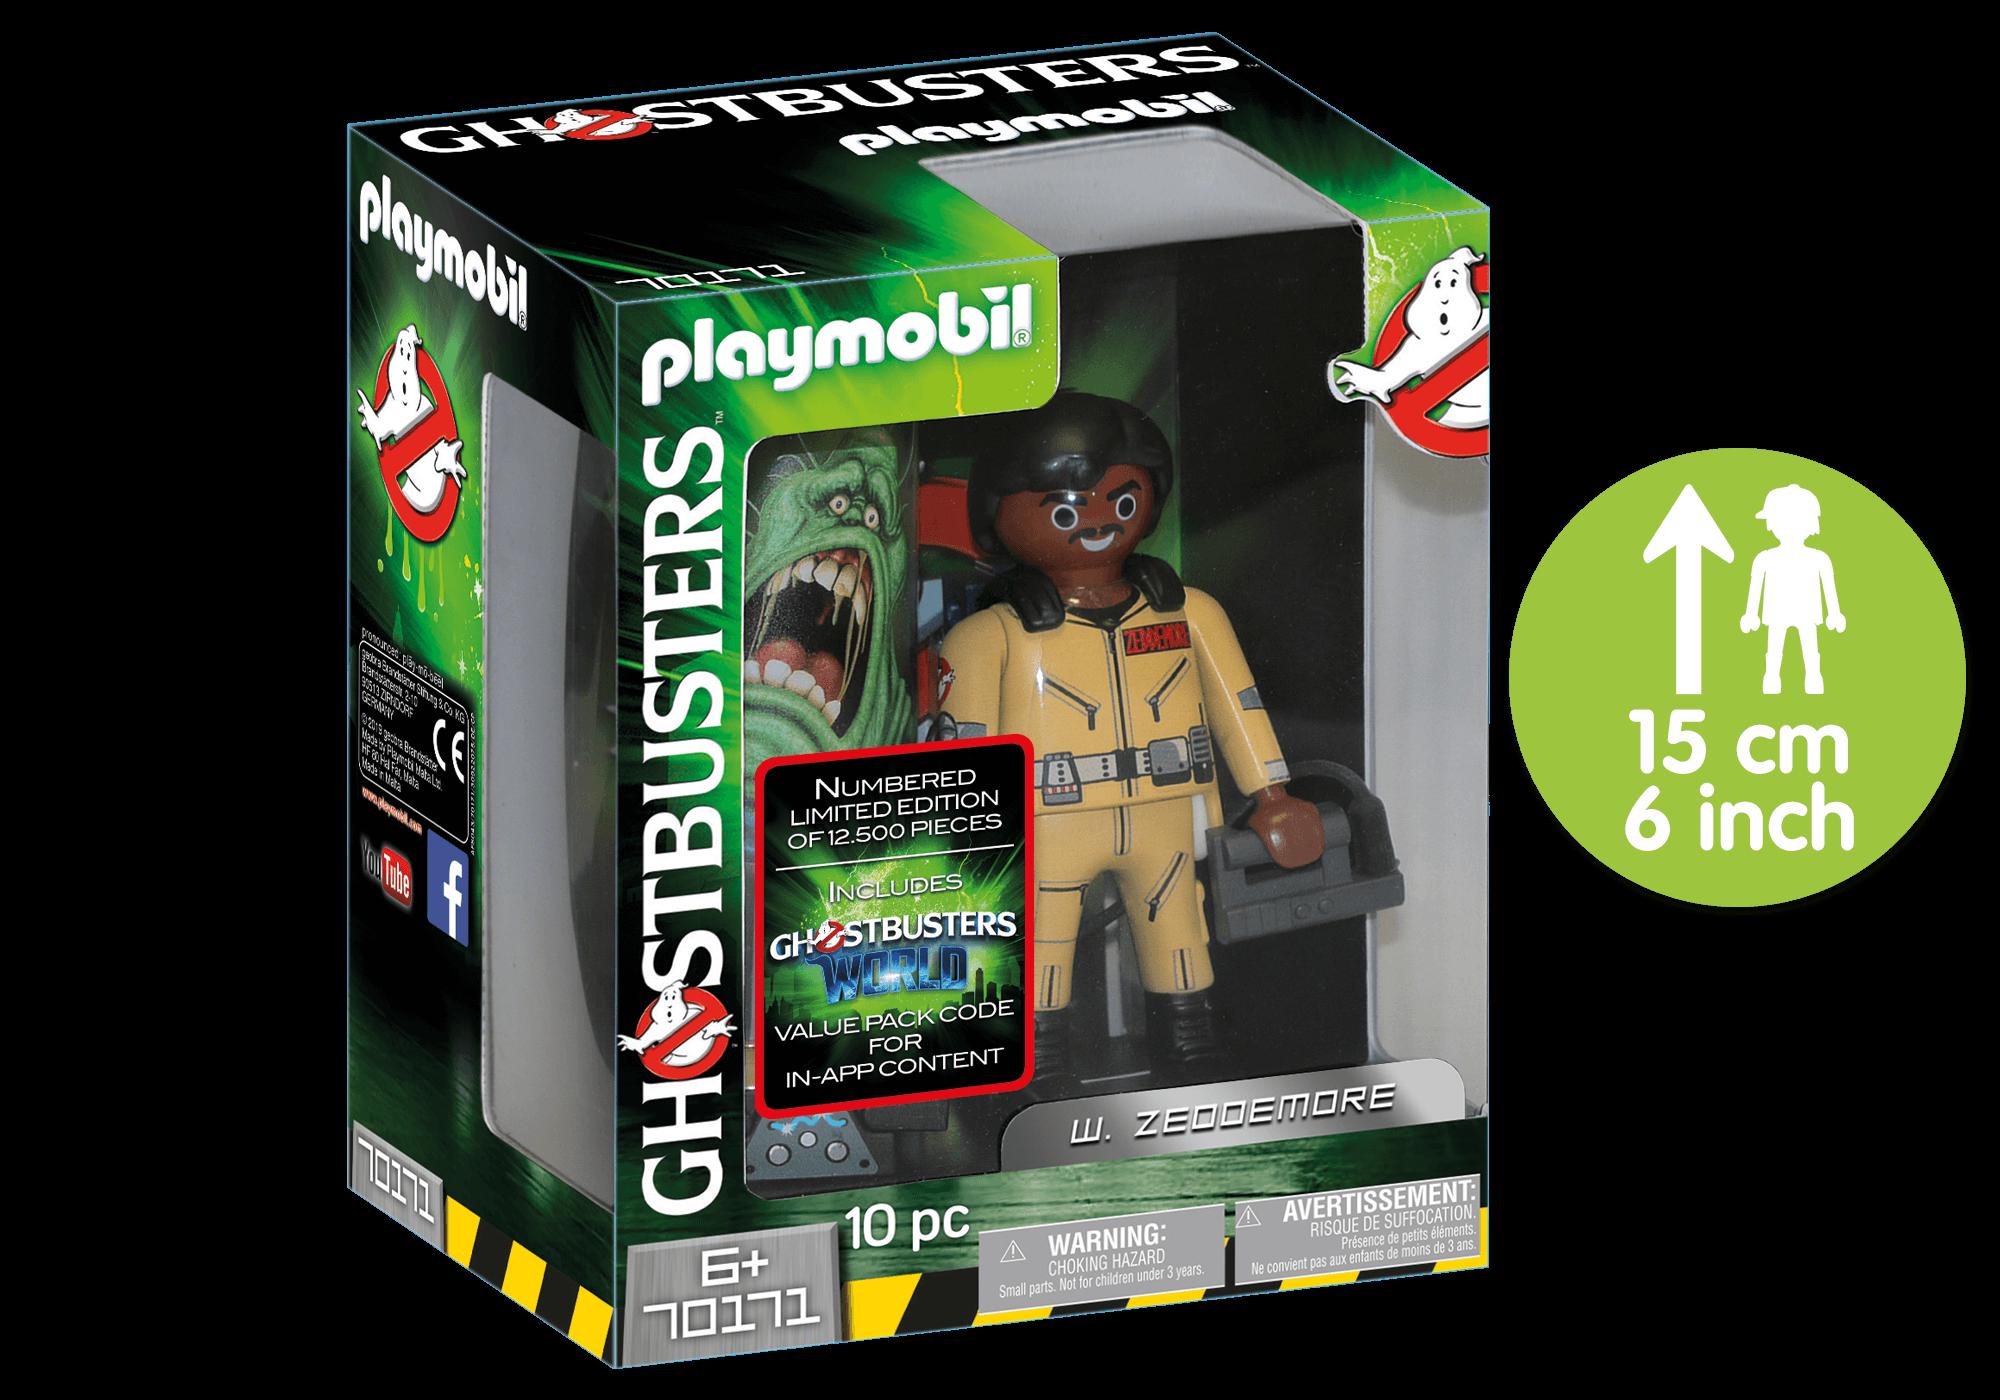 http://media.playmobil.com/i/playmobil/70171_product_detail/Ghostbusters™ Samlefigur W. Zeddemore